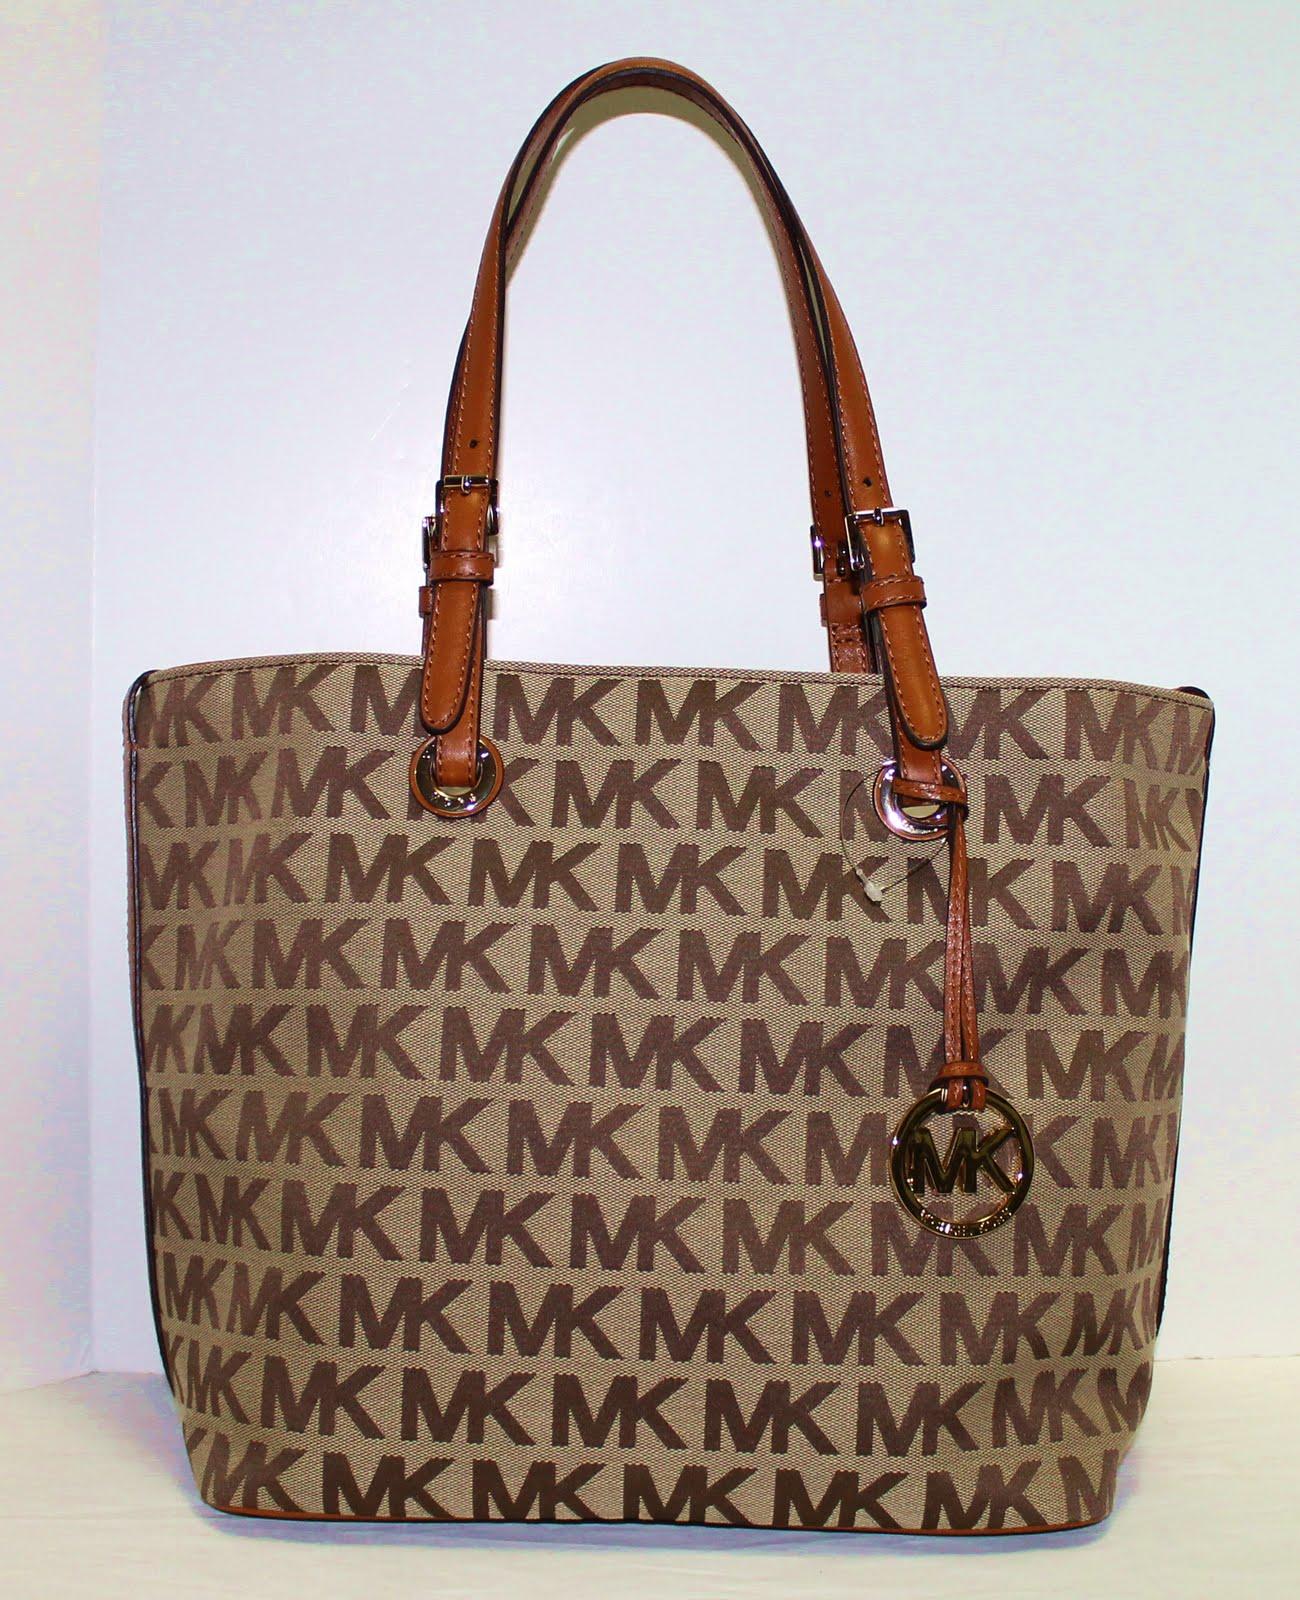 aabc6b5a9dd8c1 Michael Kors Handbags Malaysia Sale | Stanford Center for ...